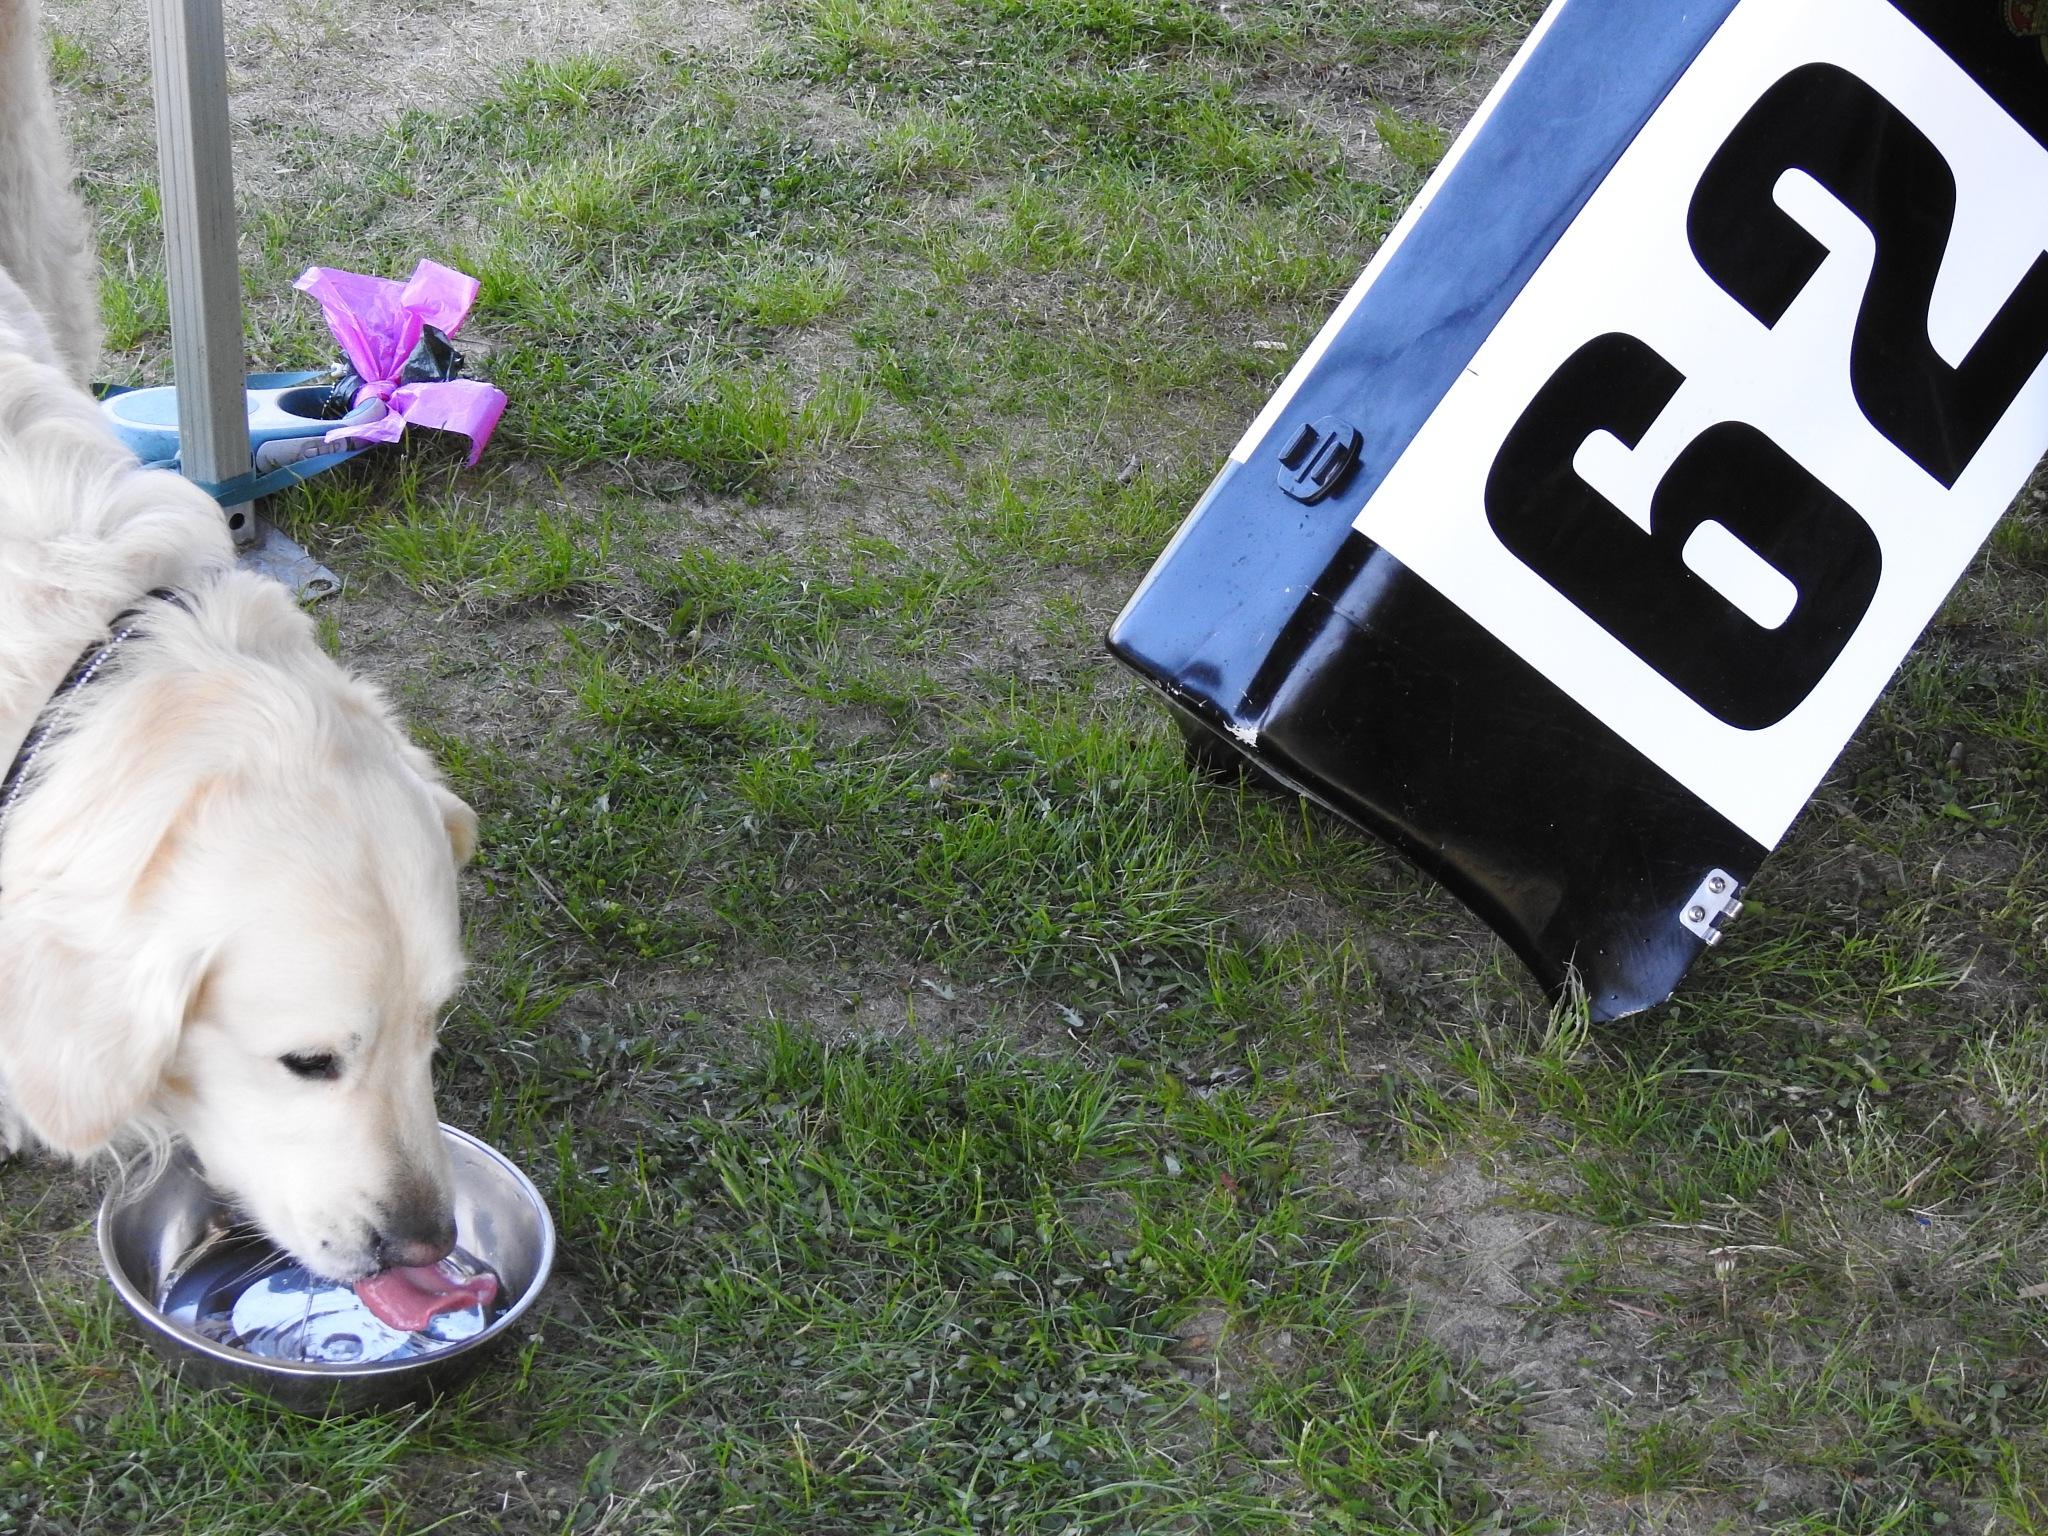 Racing dog by tranaker